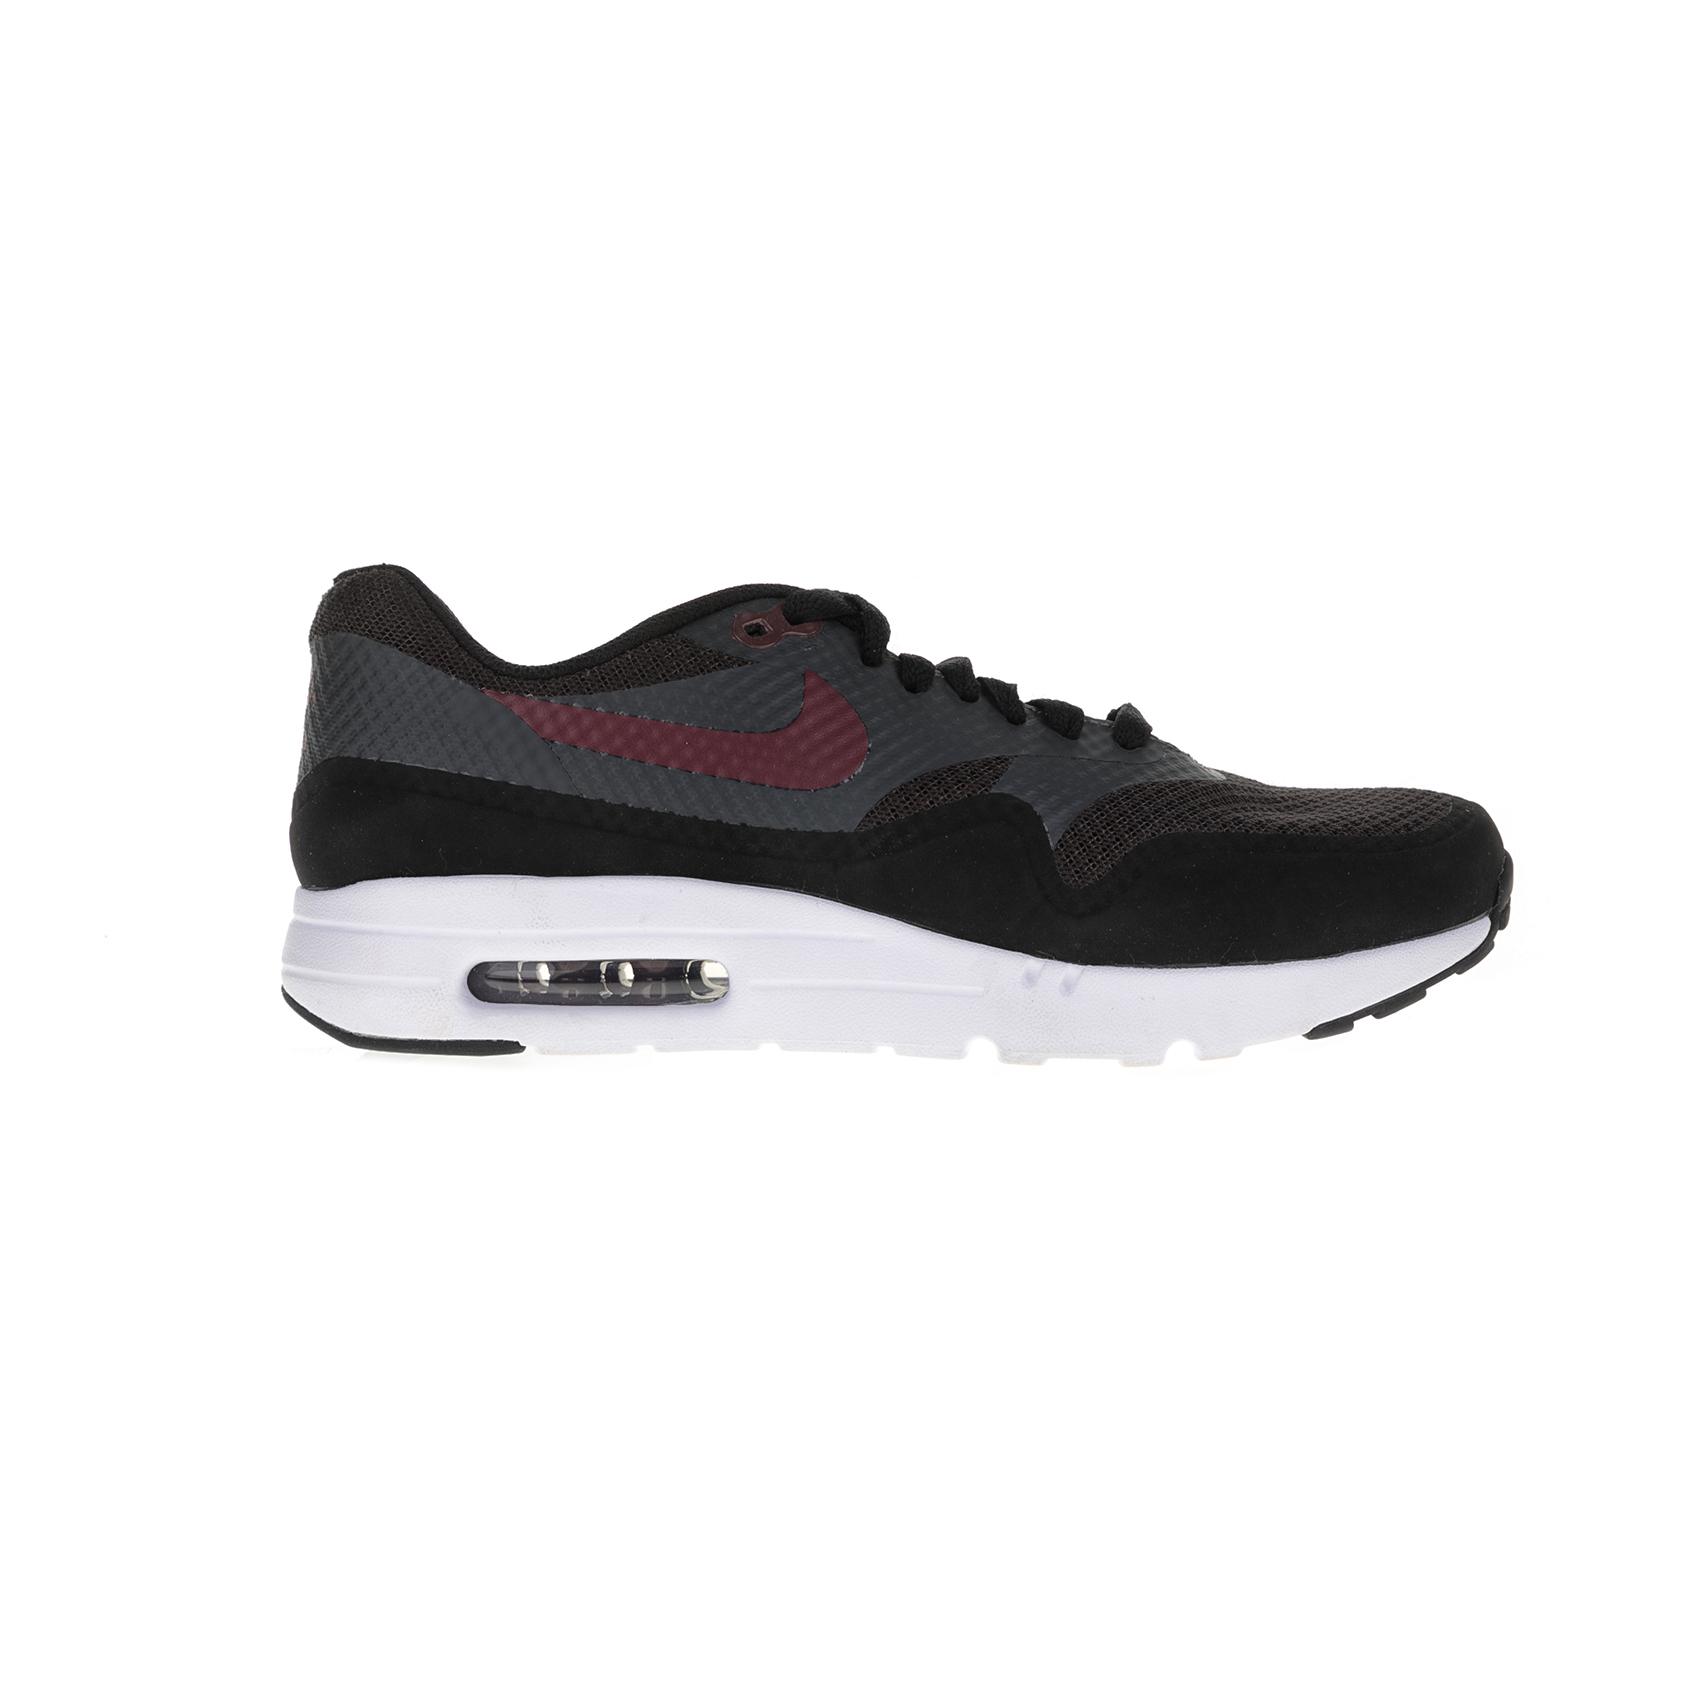 NIKE – Ανδρικά αθλητικά παπούτσια Nike AIR MAX 1 ULTRA ESSENTIAL μαύρα